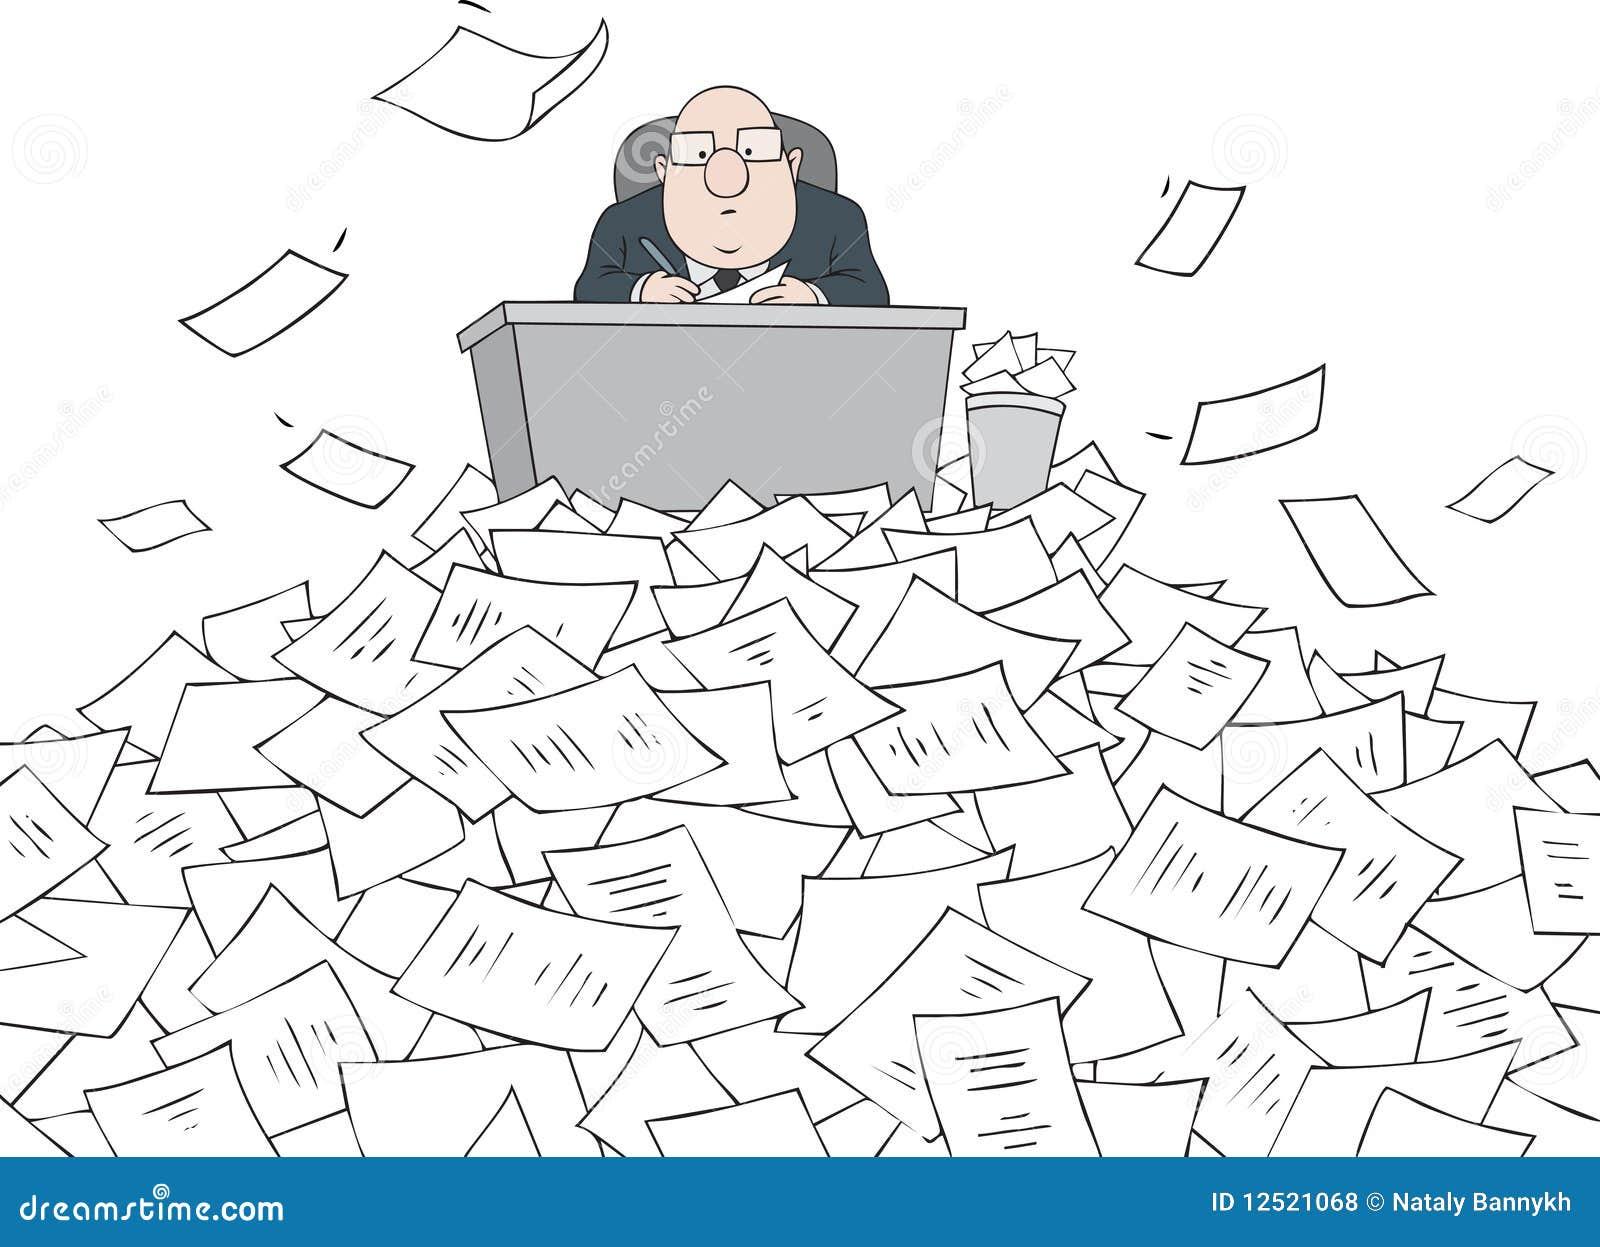 Why is Bureaucracy important?